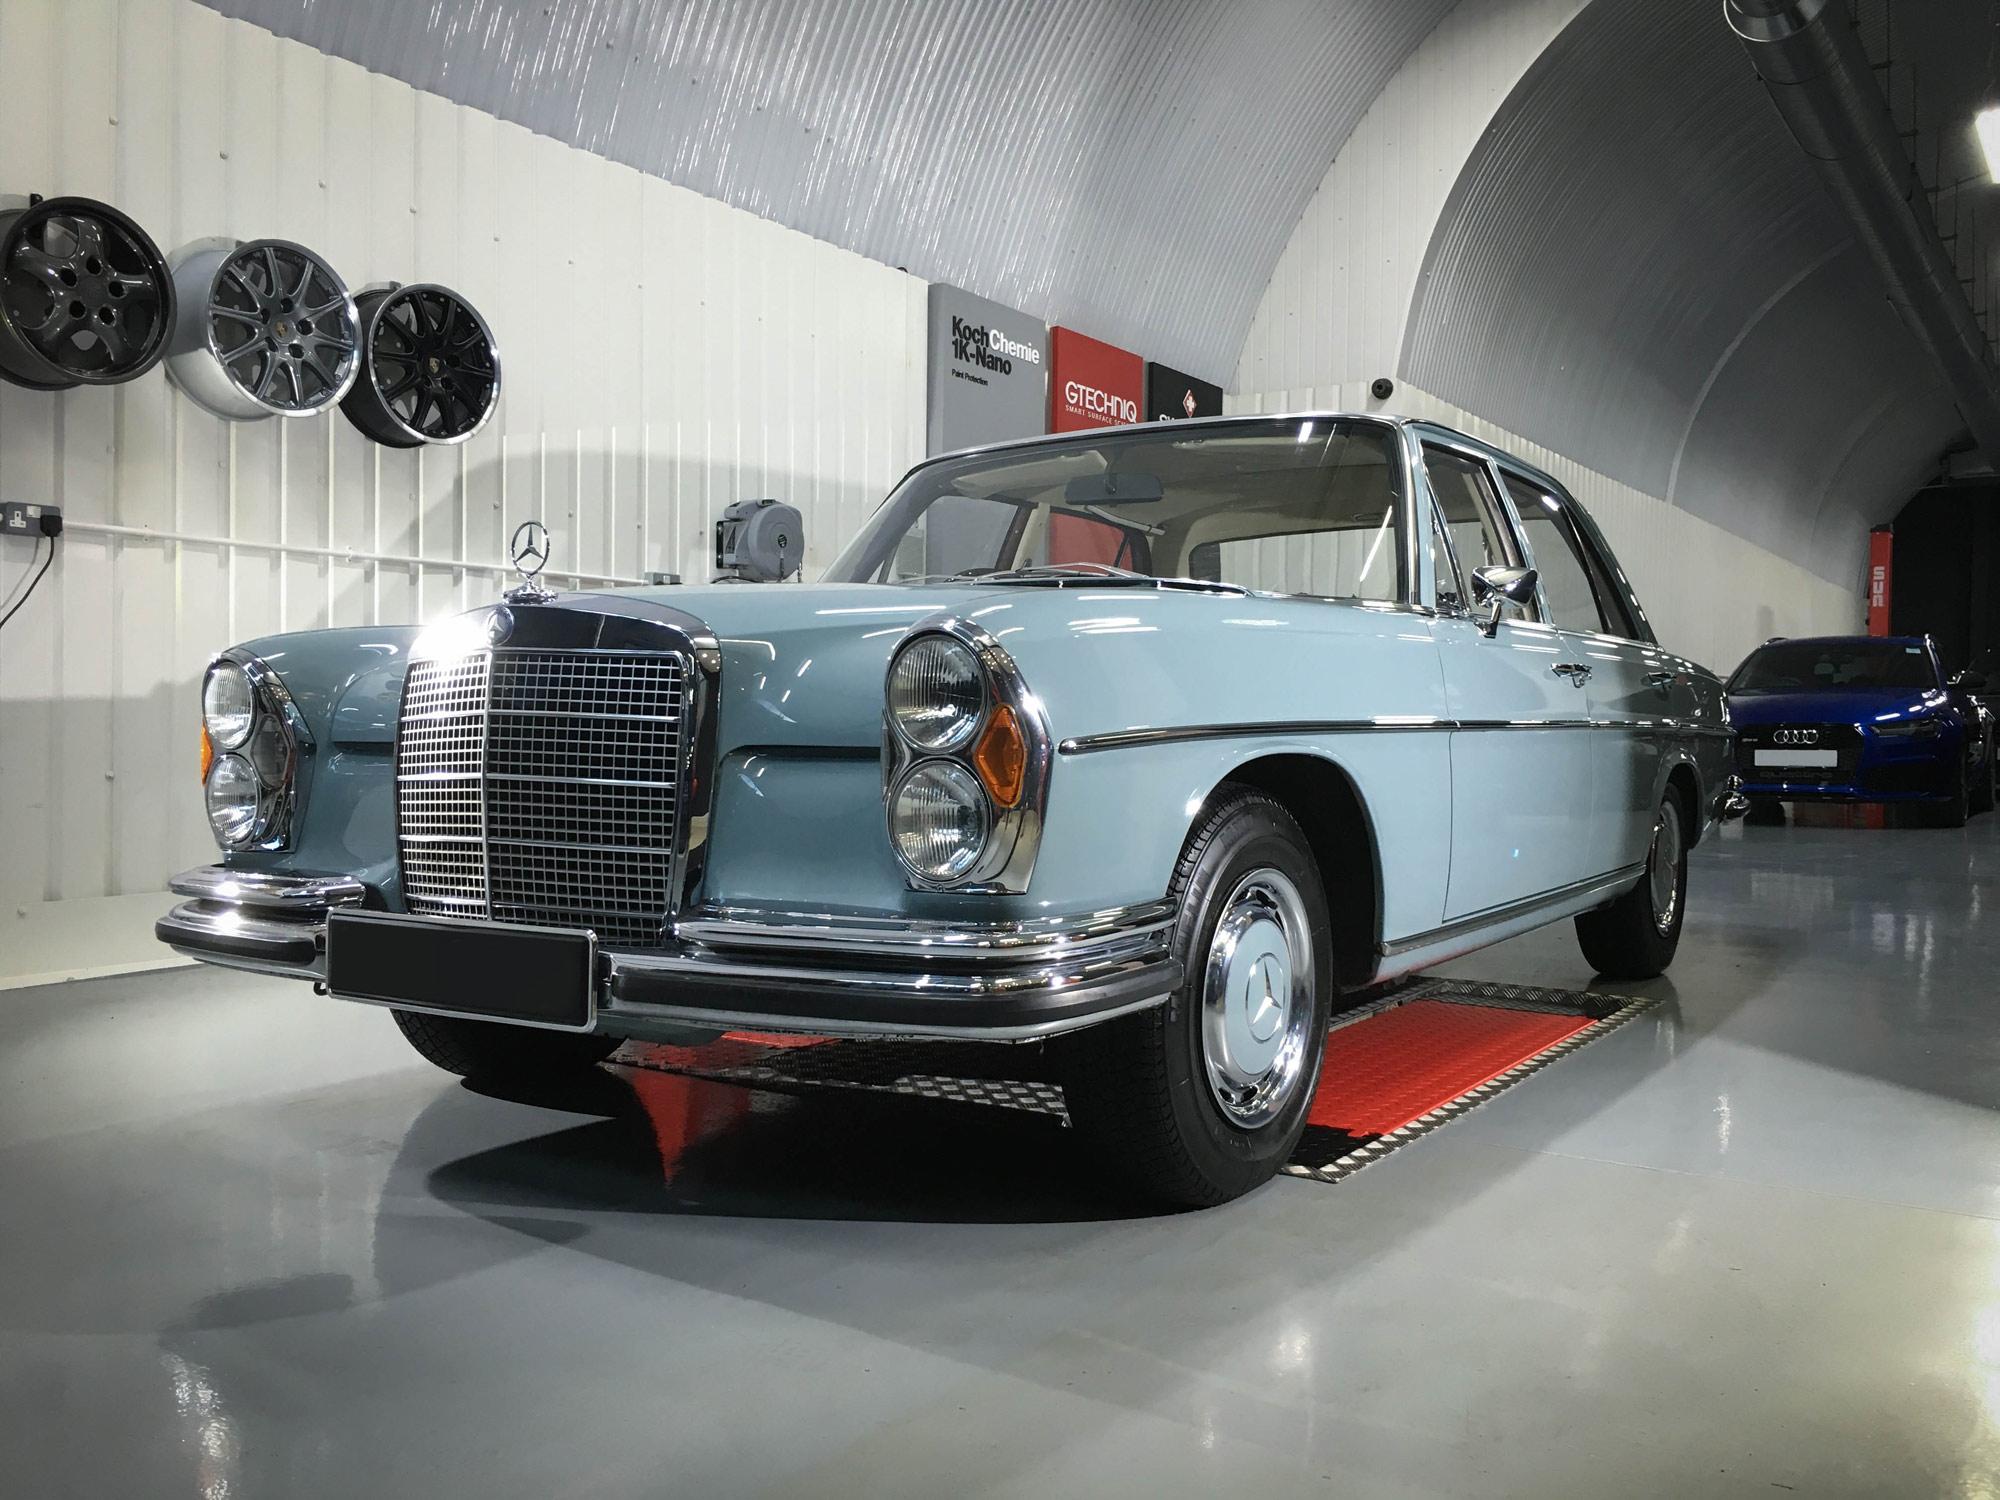 Mercedes_280se-front-passengers-side